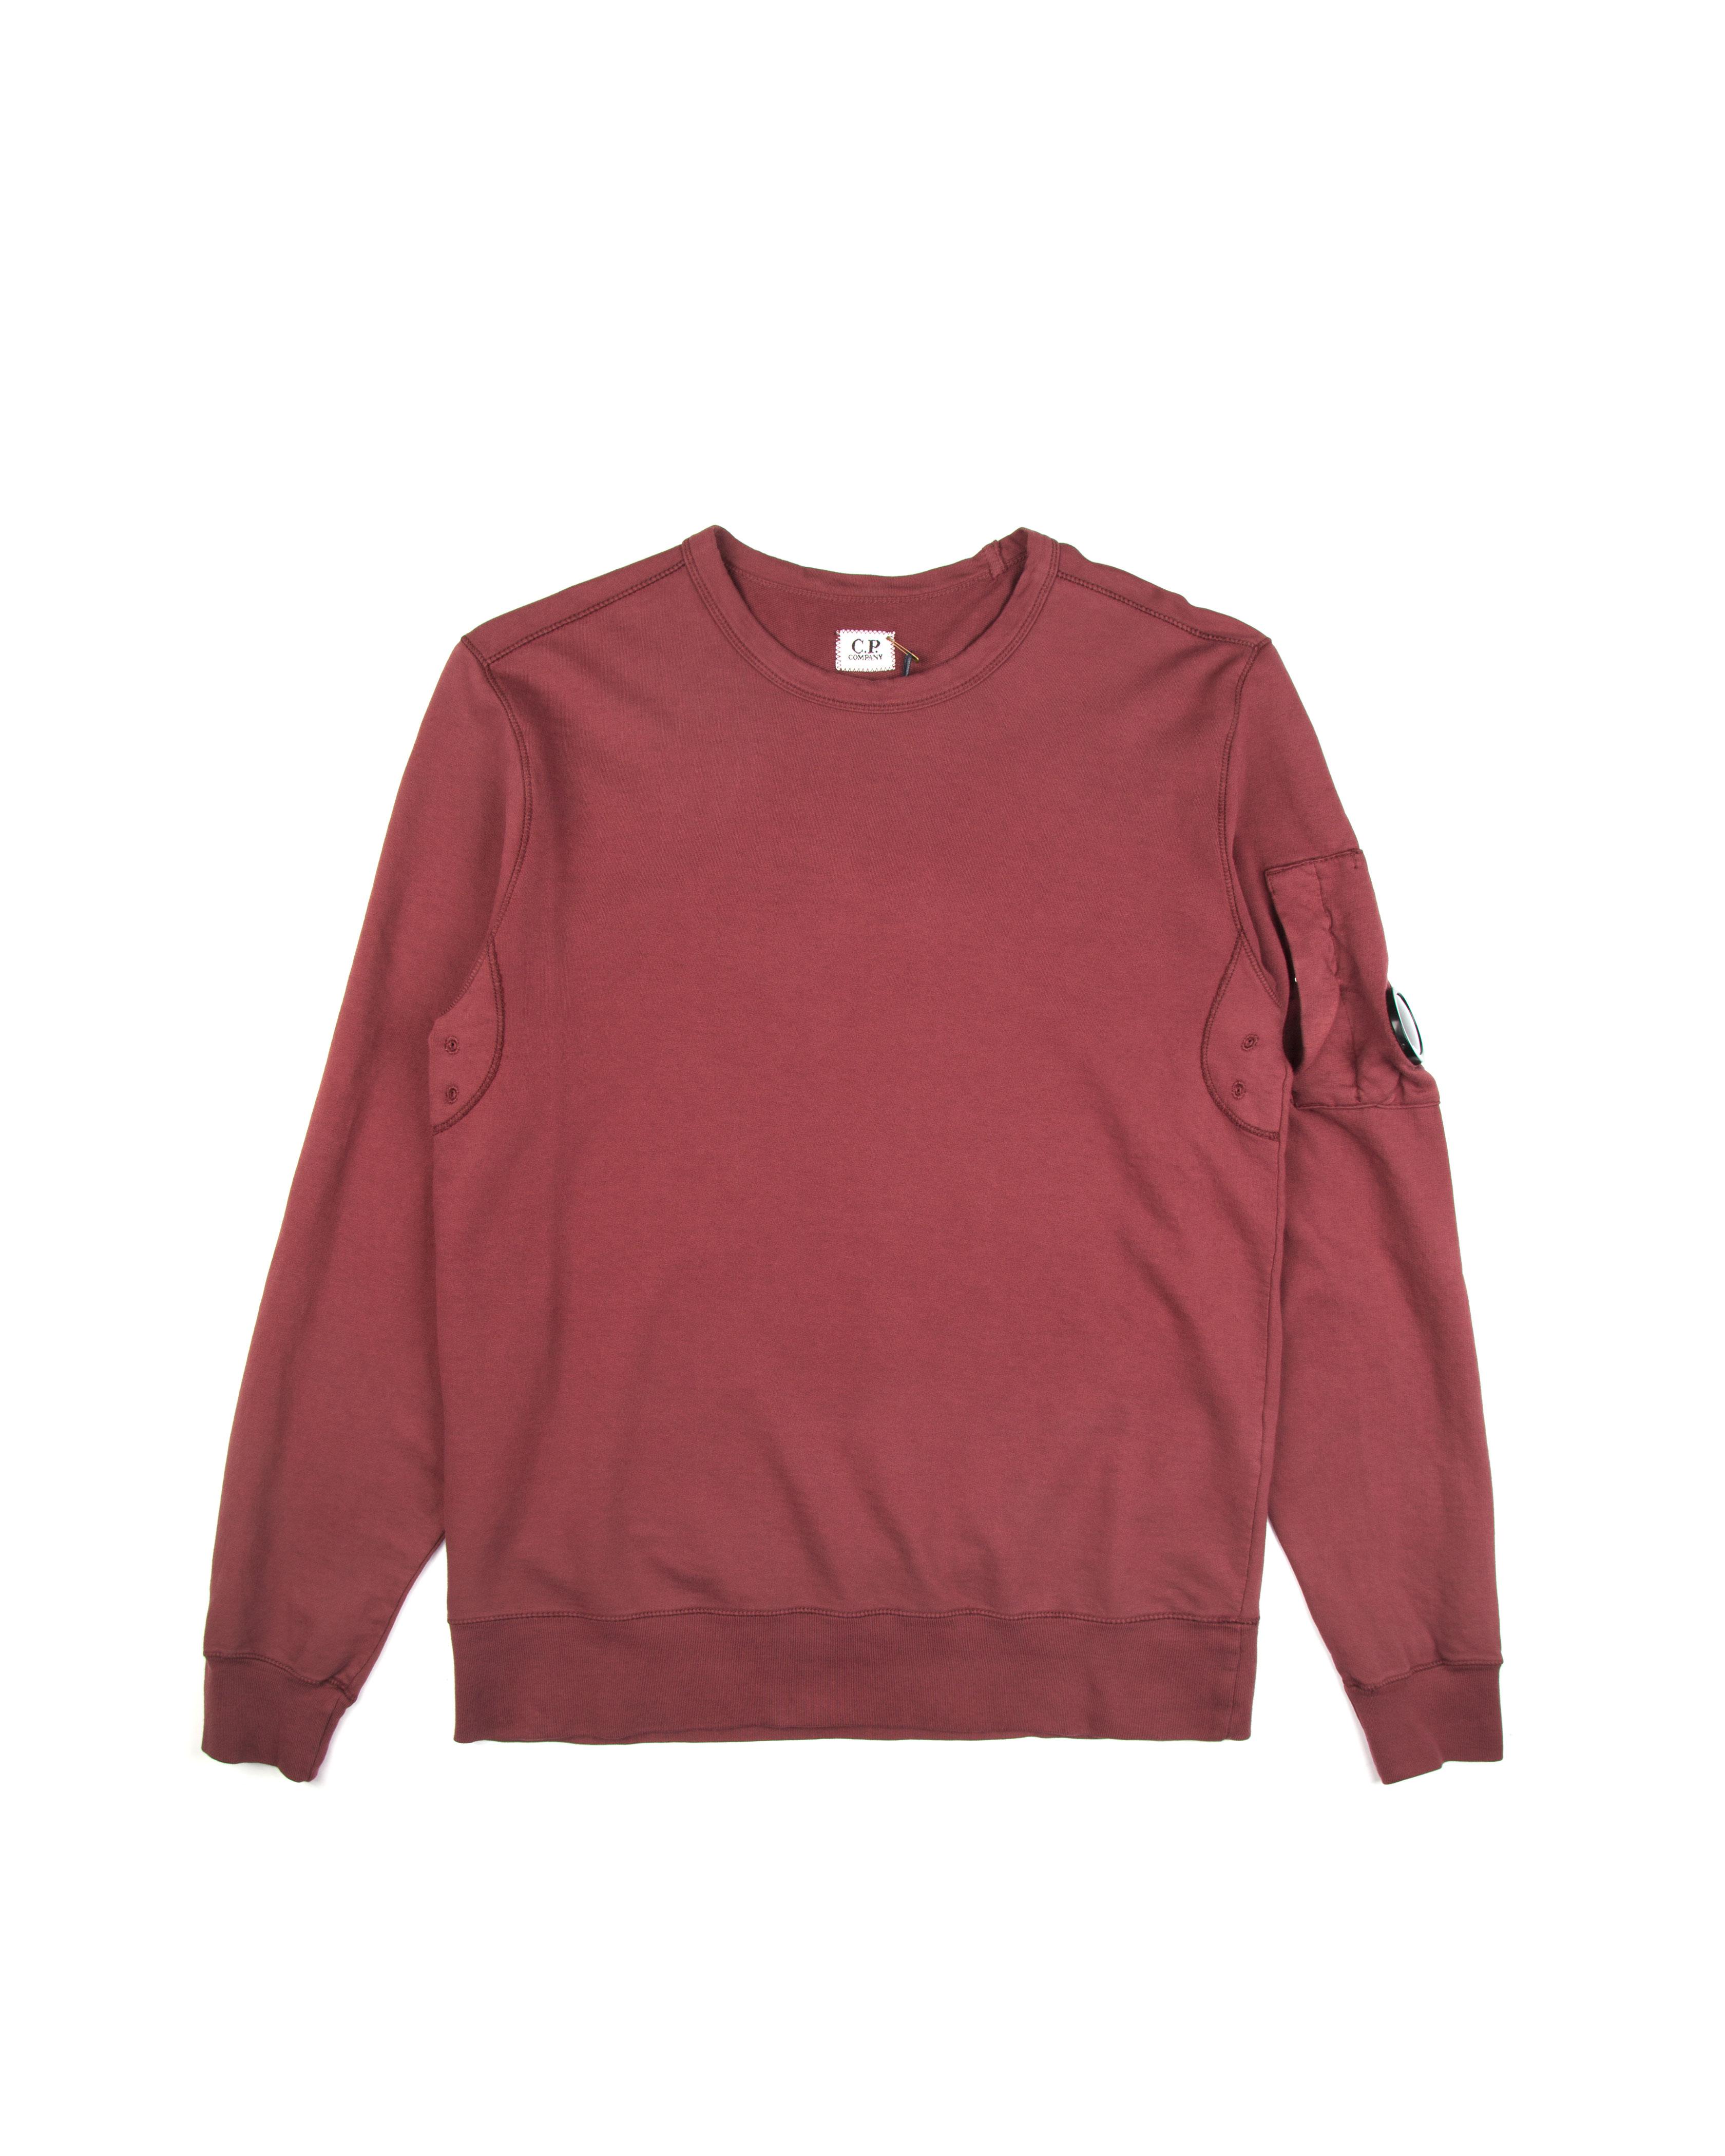 Свитшот C.P.Company Watchviewer Bordo Sweatshirt